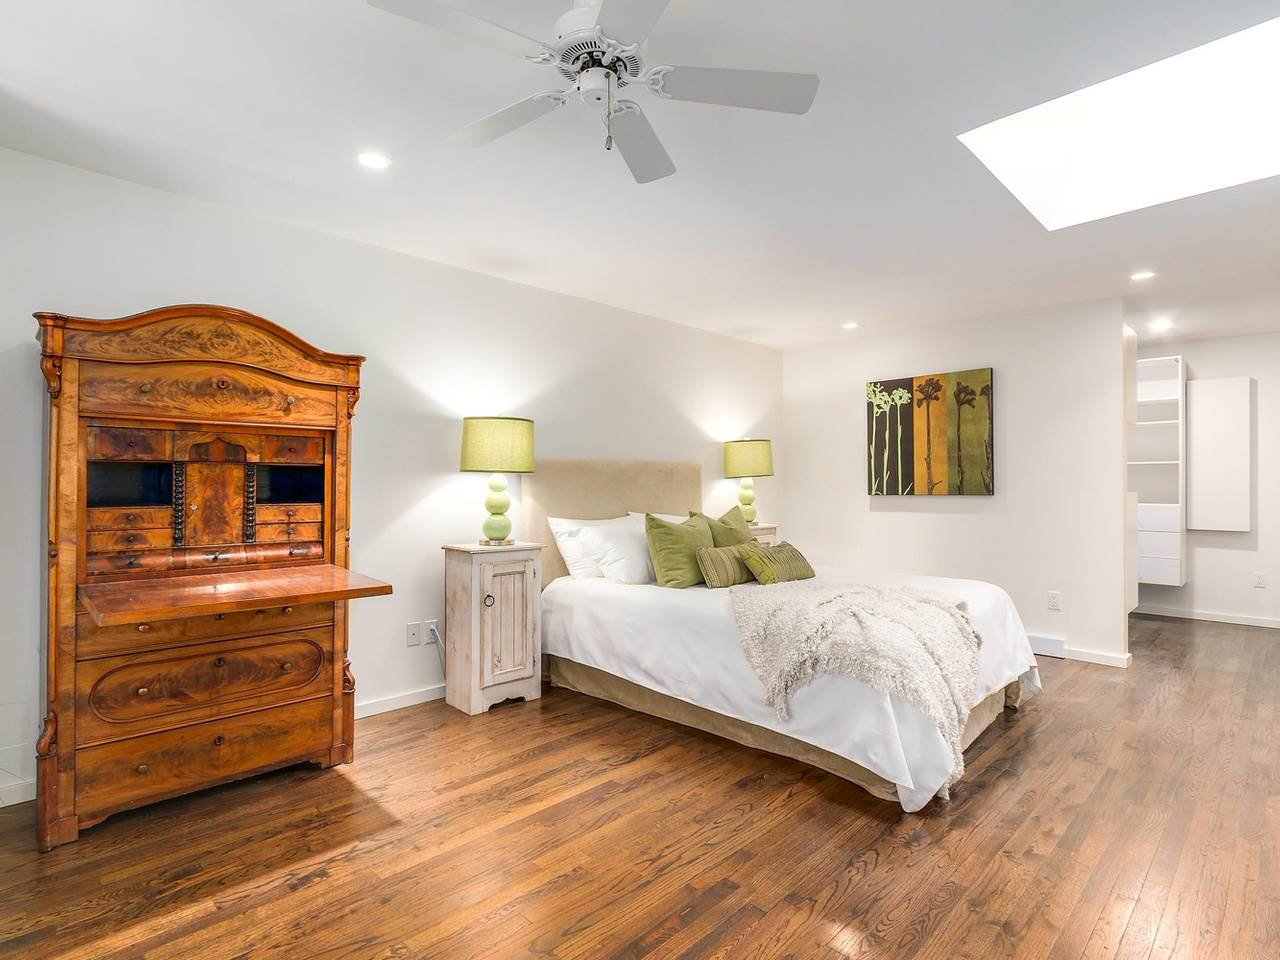 Photo 15: Photos: 3708 EDGEMONT Boulevard in North Vancouver: Edgemont House Fourplex for sale : MLS®# R2138514